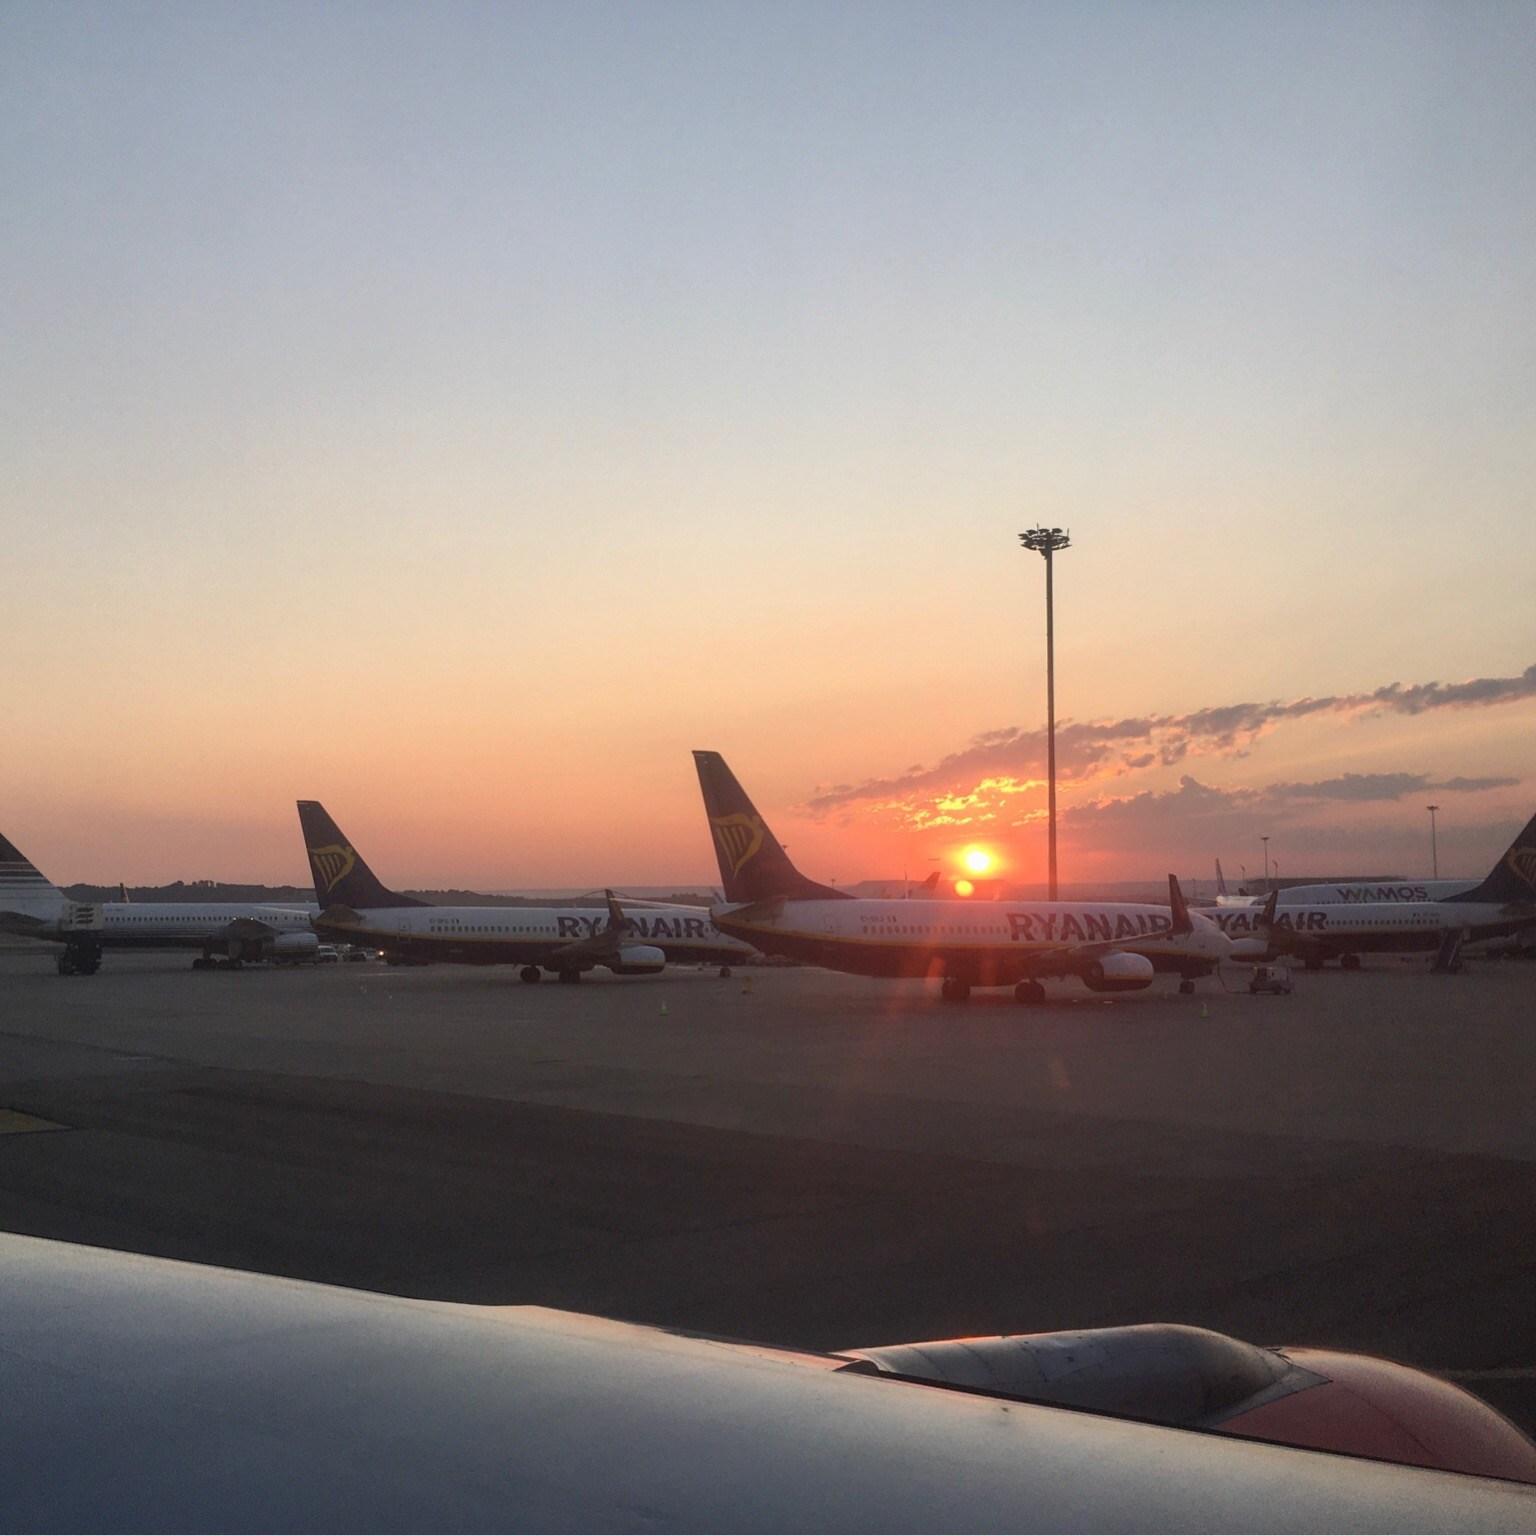 Sunrise over Madrid Airport